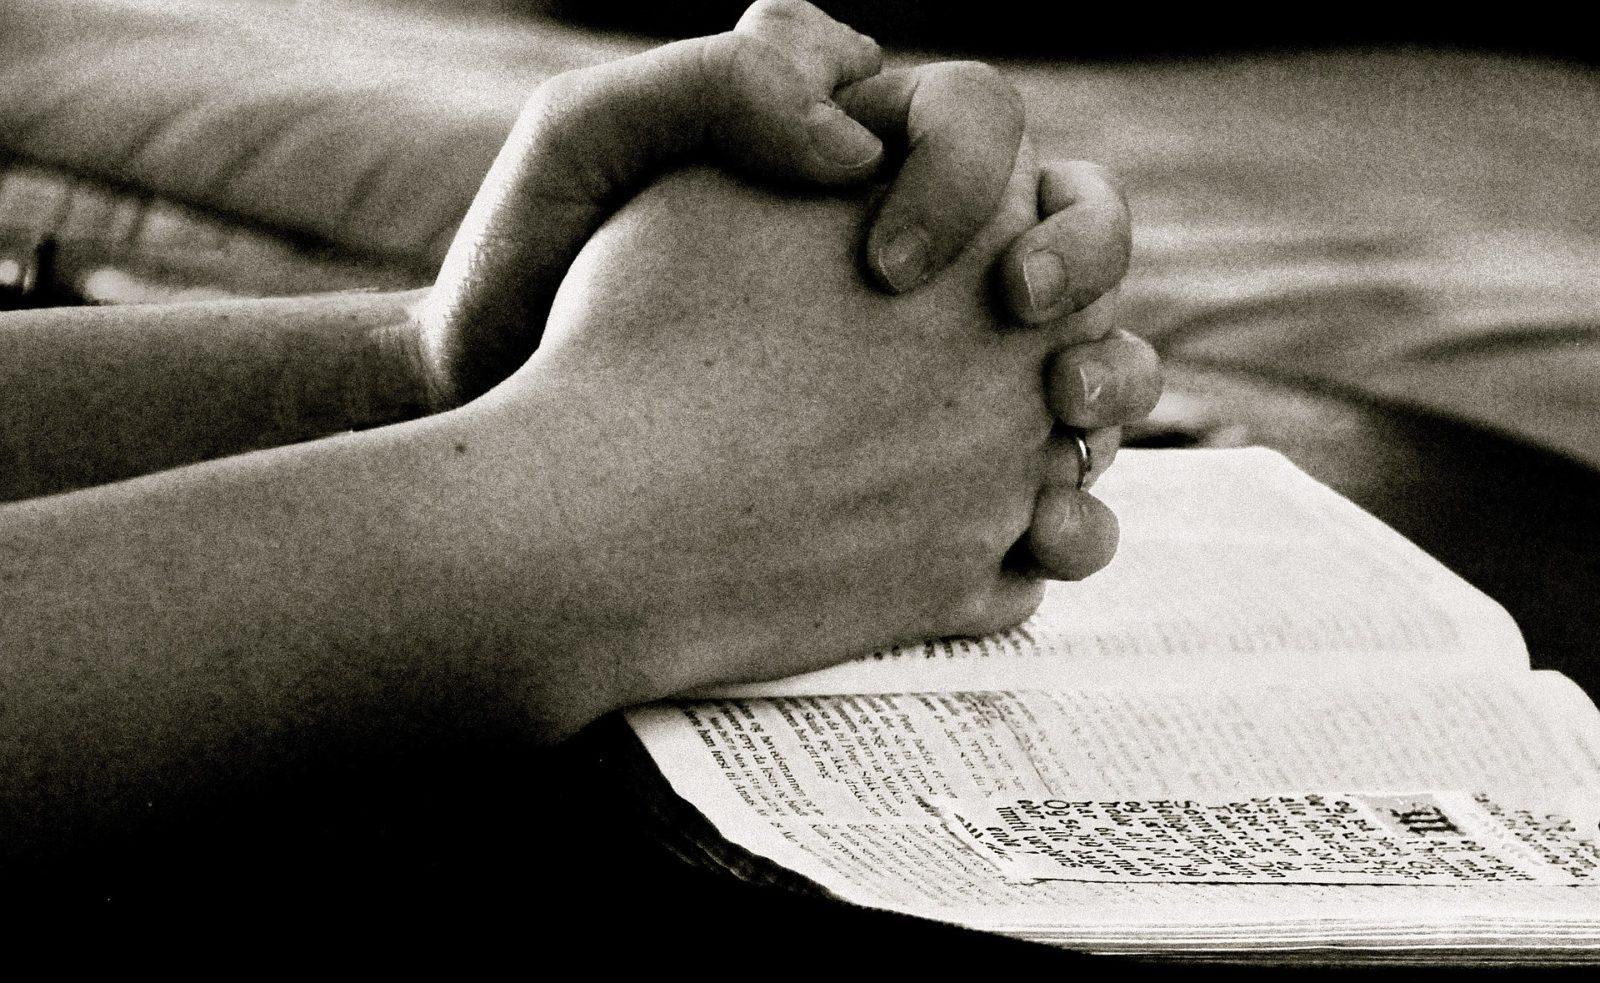 pray-664786_1920